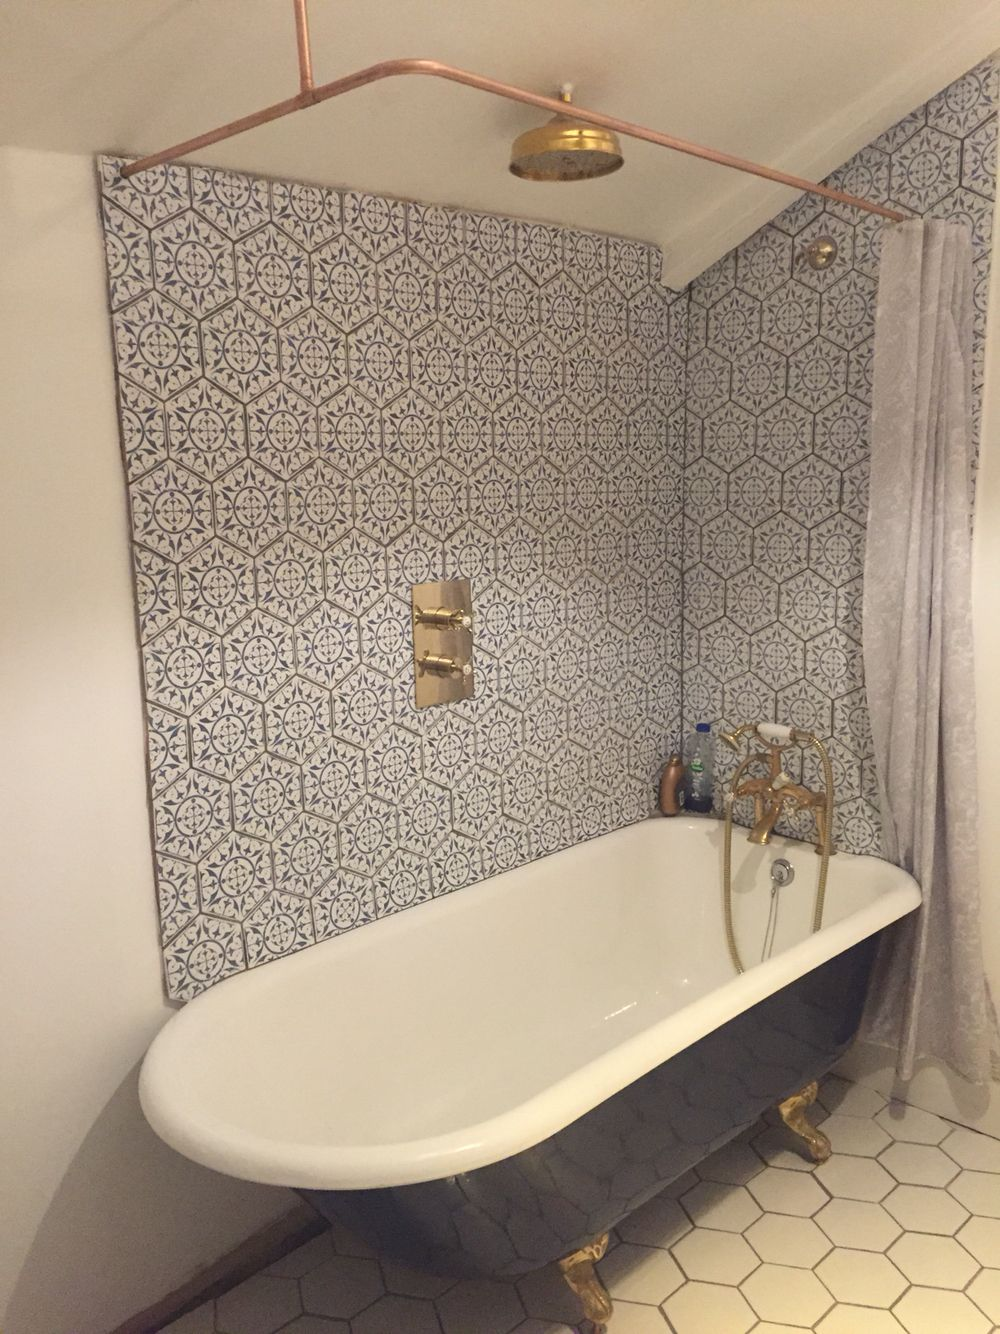 Cast Iron Bath With Copper Shower Curtain Rail Hexagon Tiles In Our Victorian Terrace Bathroom Shower Over Bath Shower Curtain Rods Cast Iron Bath